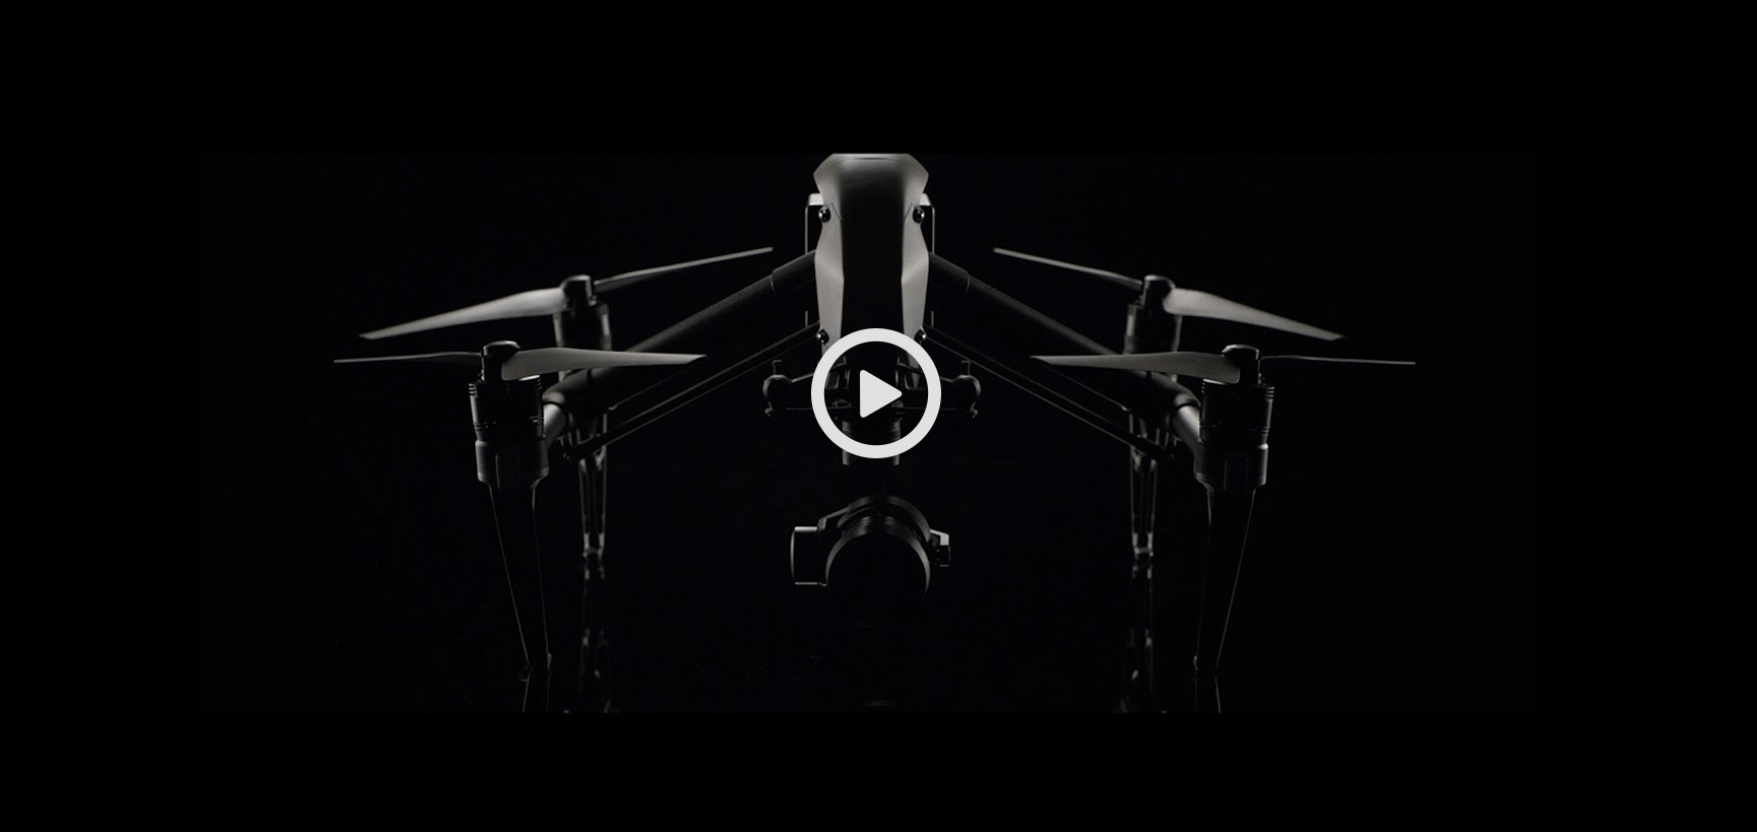 Drone snapshot